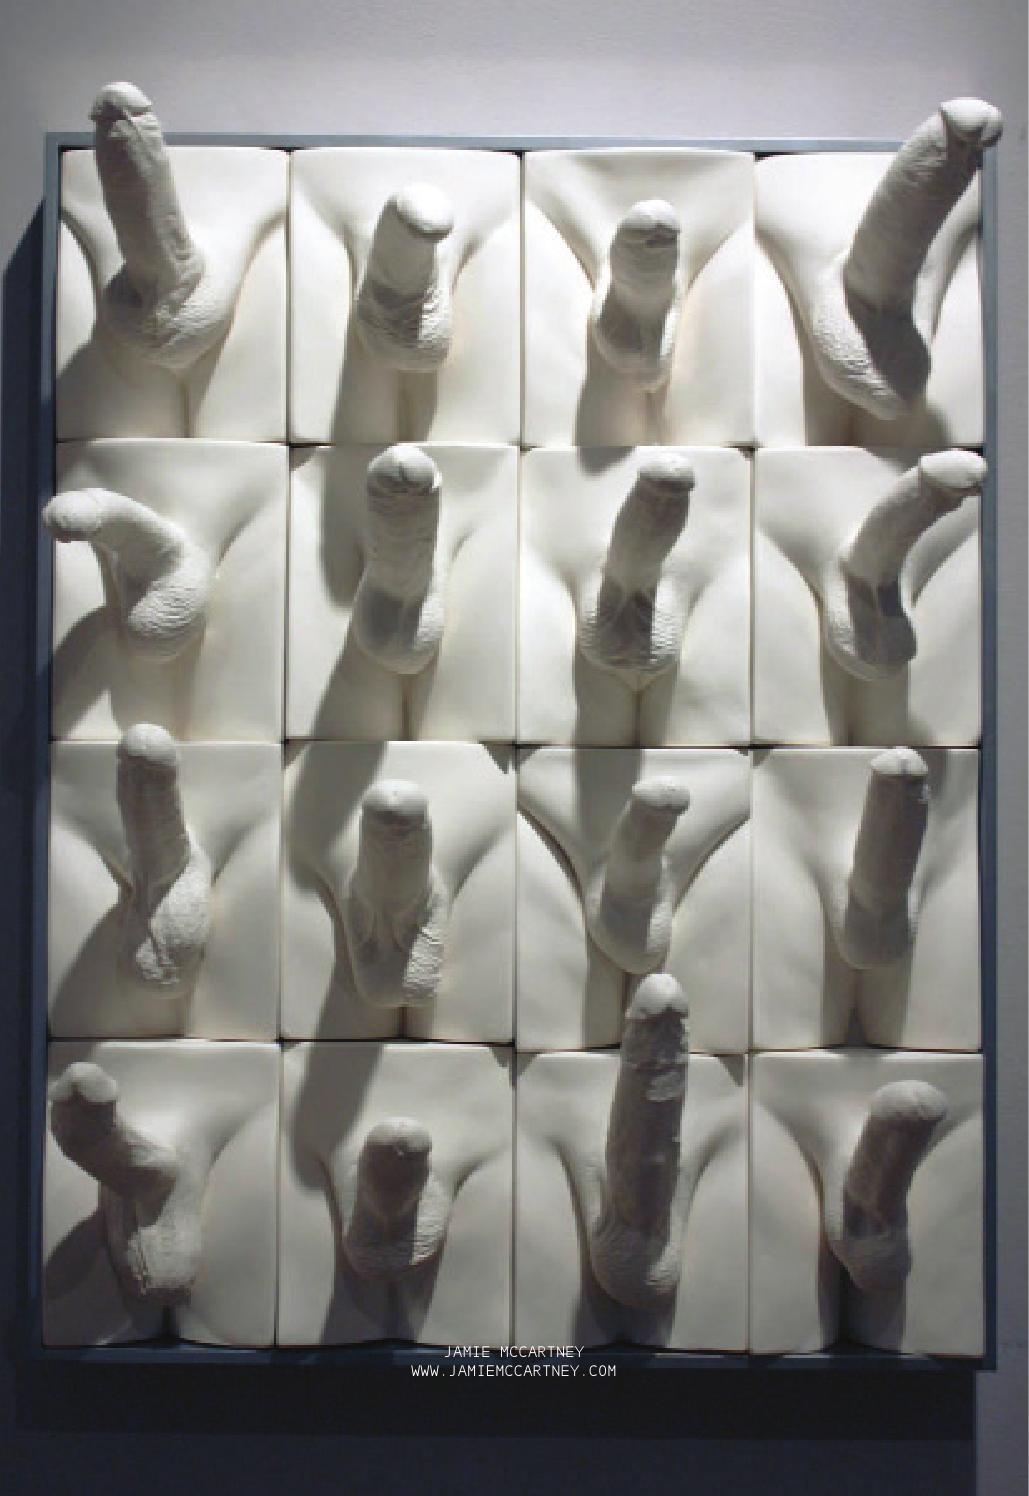 Разновидности пенисов фото